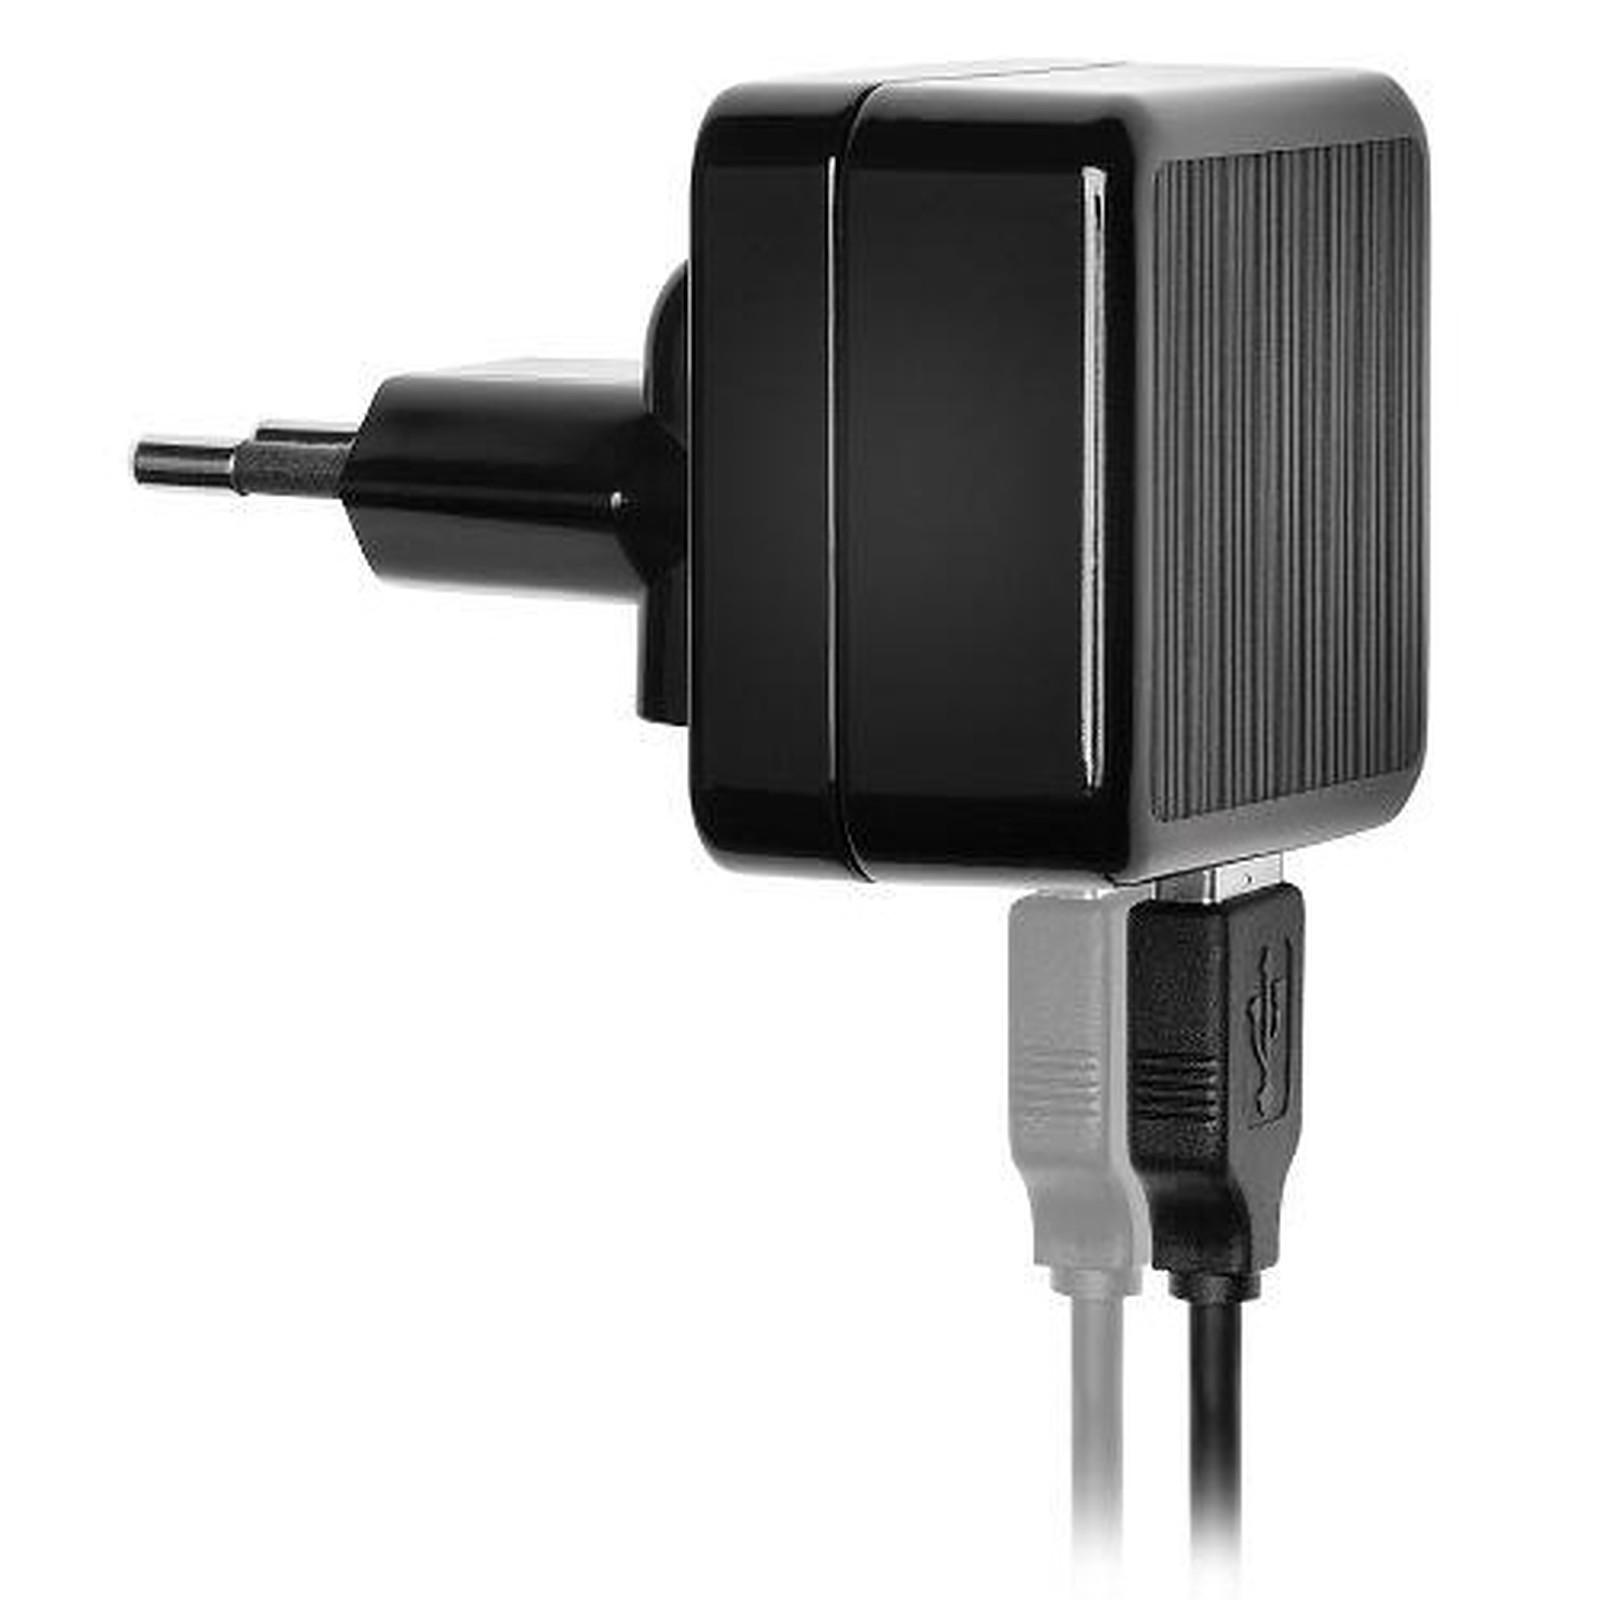 Kensington AbsolutePower USB